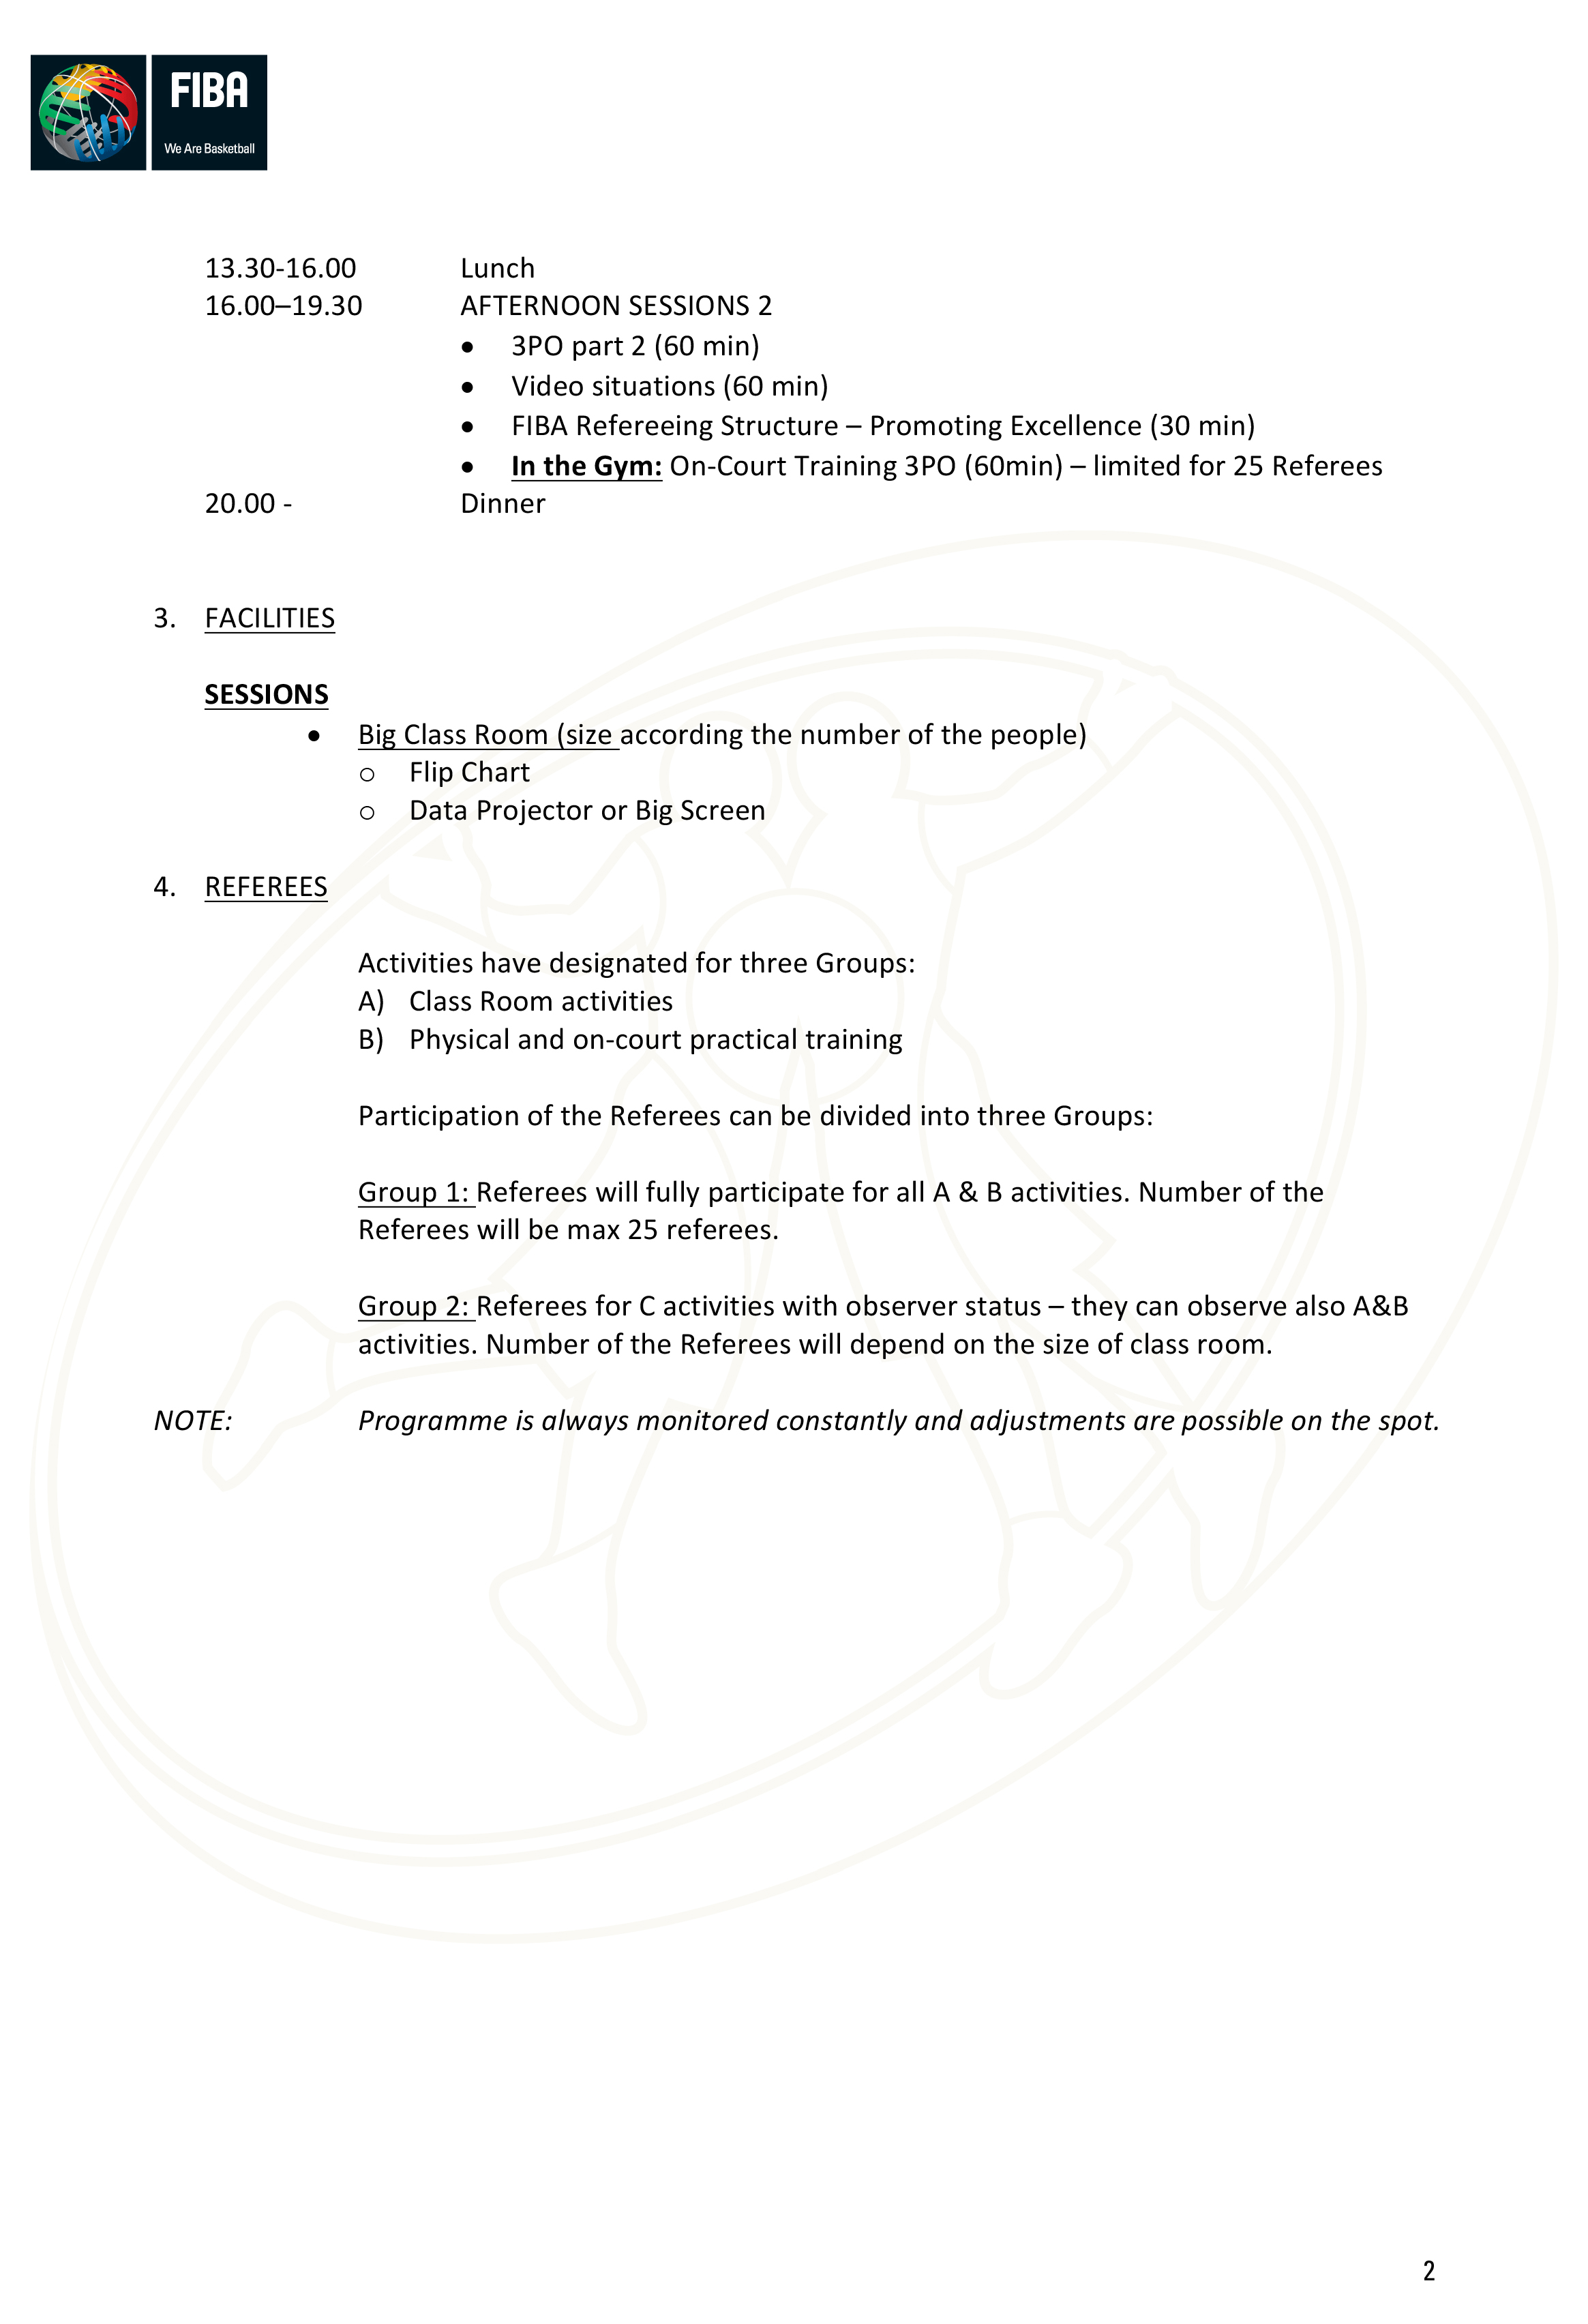 Microsoft Word - Rabat_MOR_CAMP2016_Programme.docx